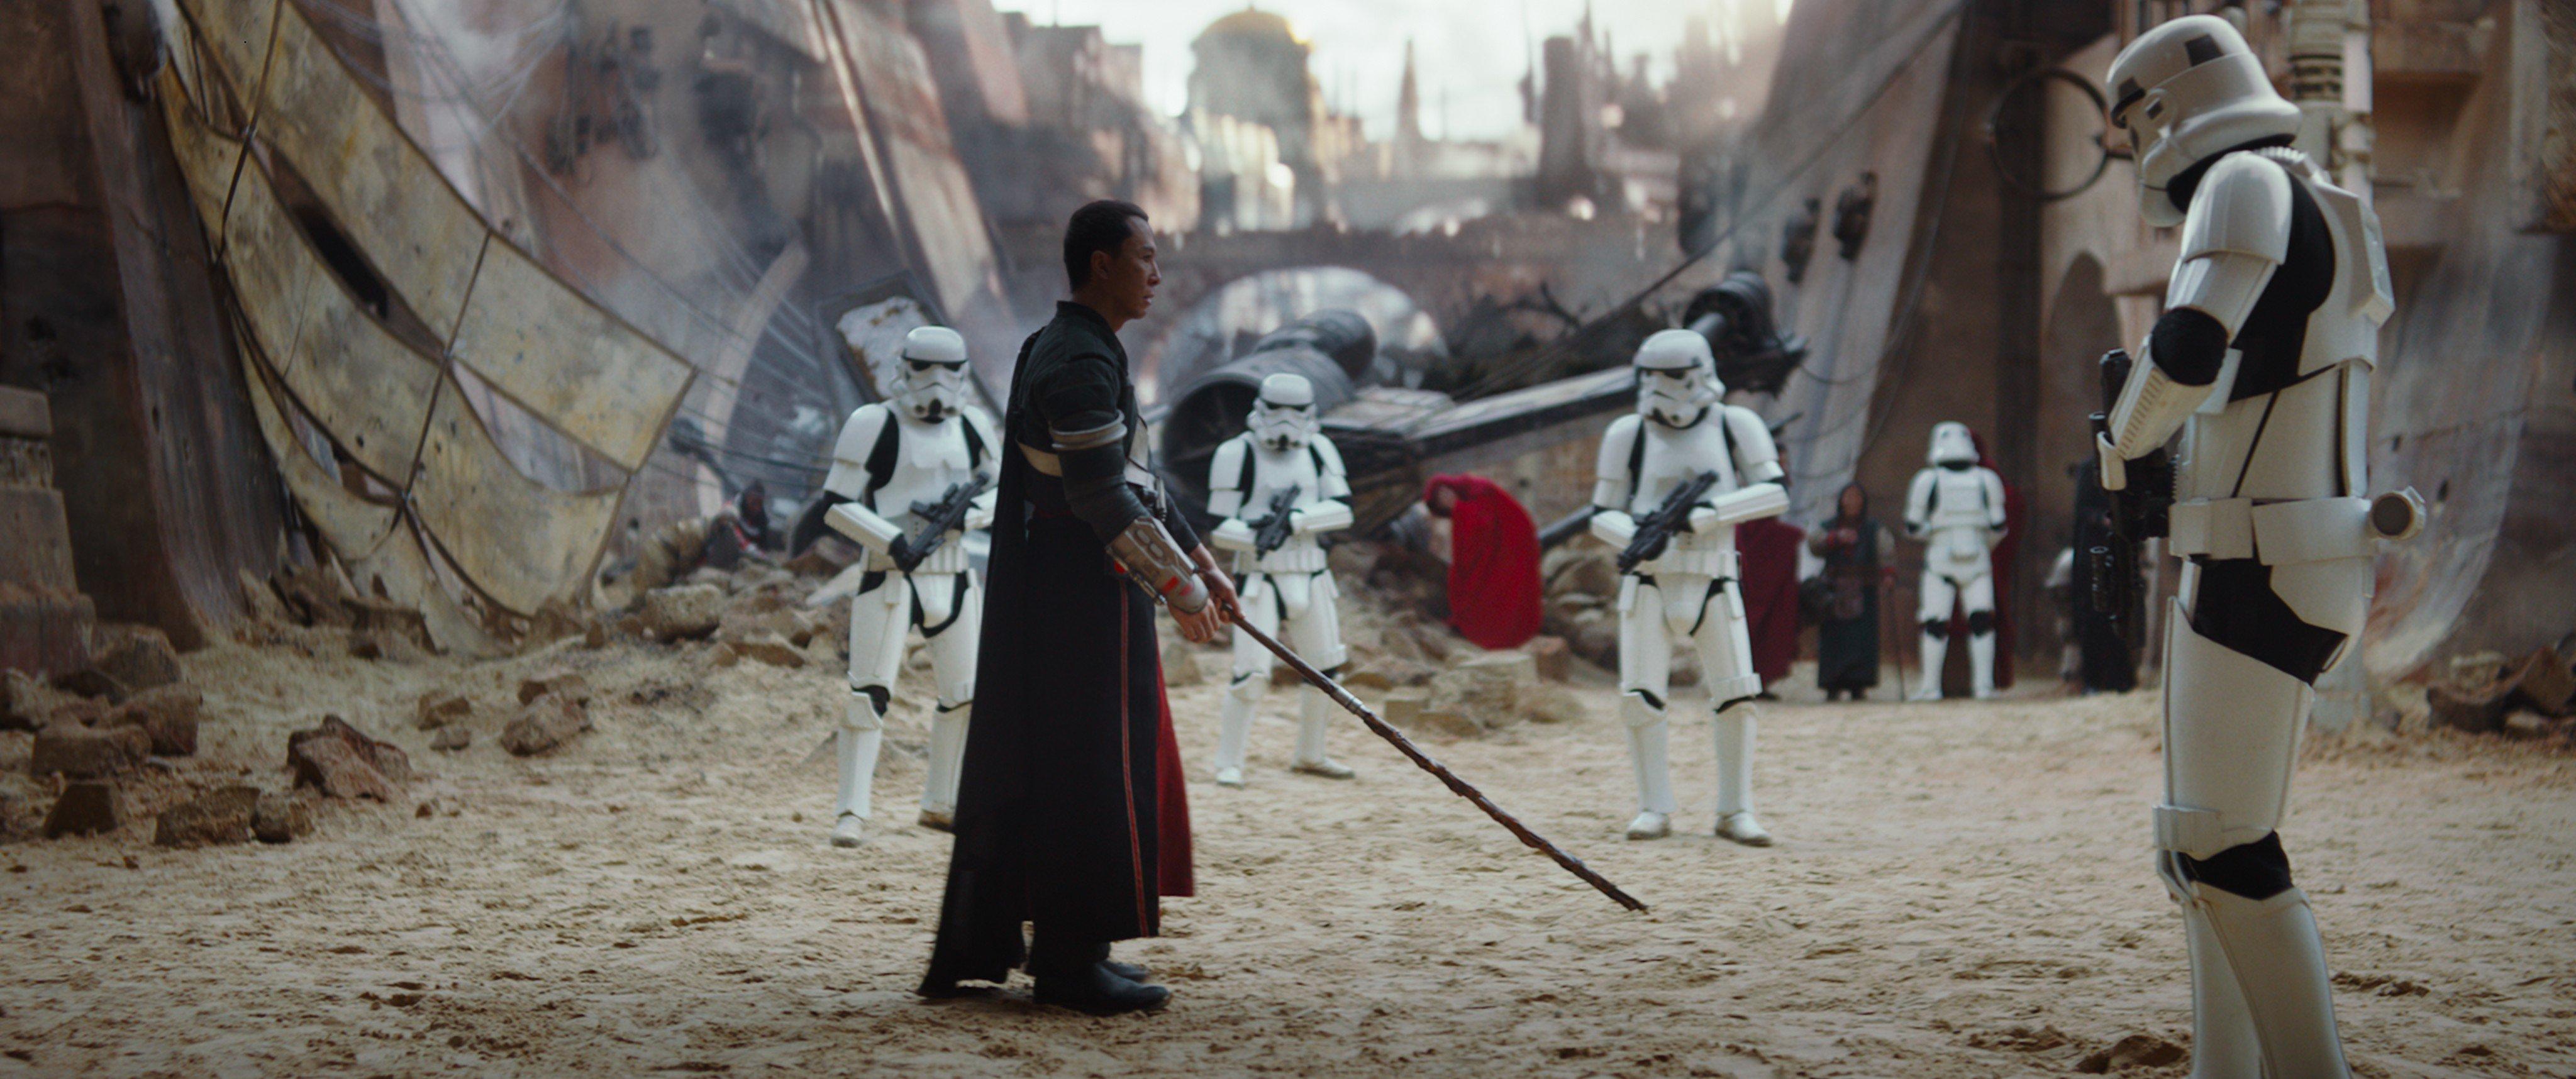 1366x768 Rogue One Star Wars Movie 1366x768 Resolution Hd 4k